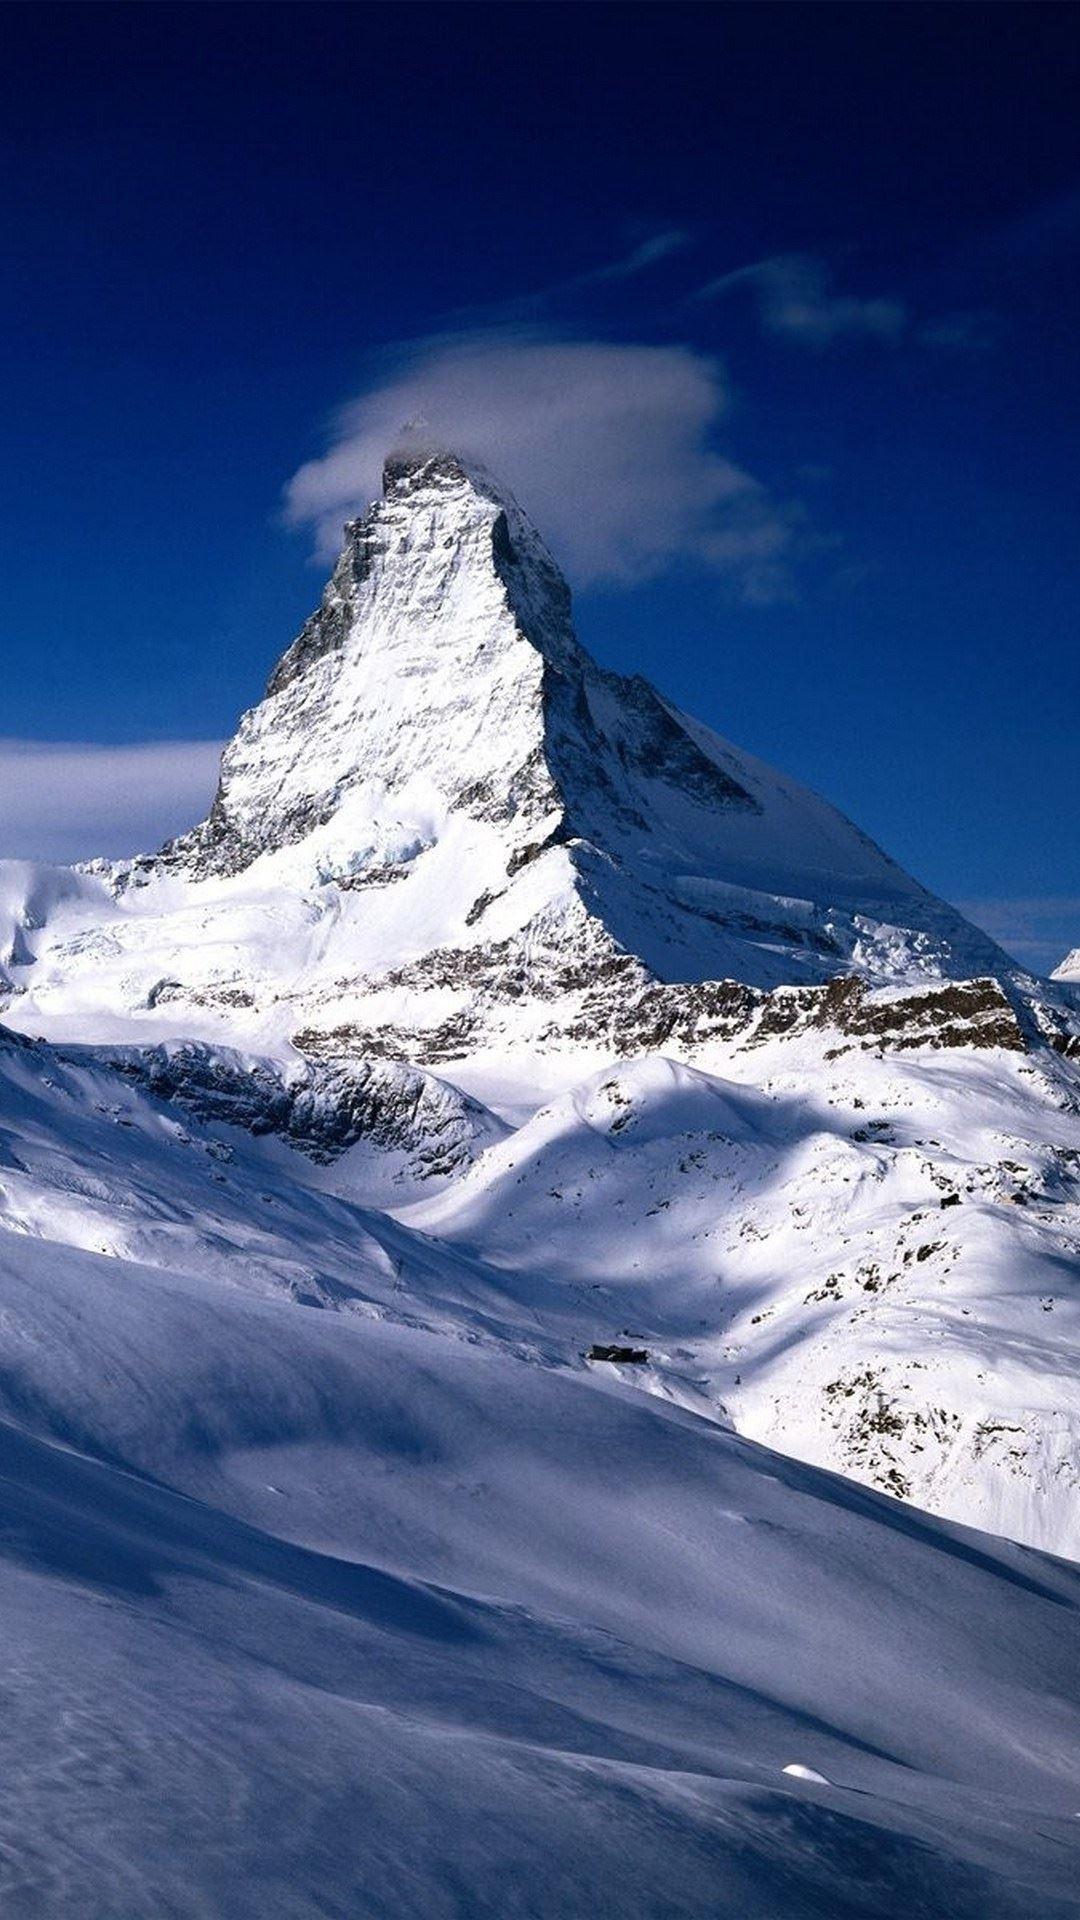 Swiss Alps HD Wallpaper - WallpaperSafari